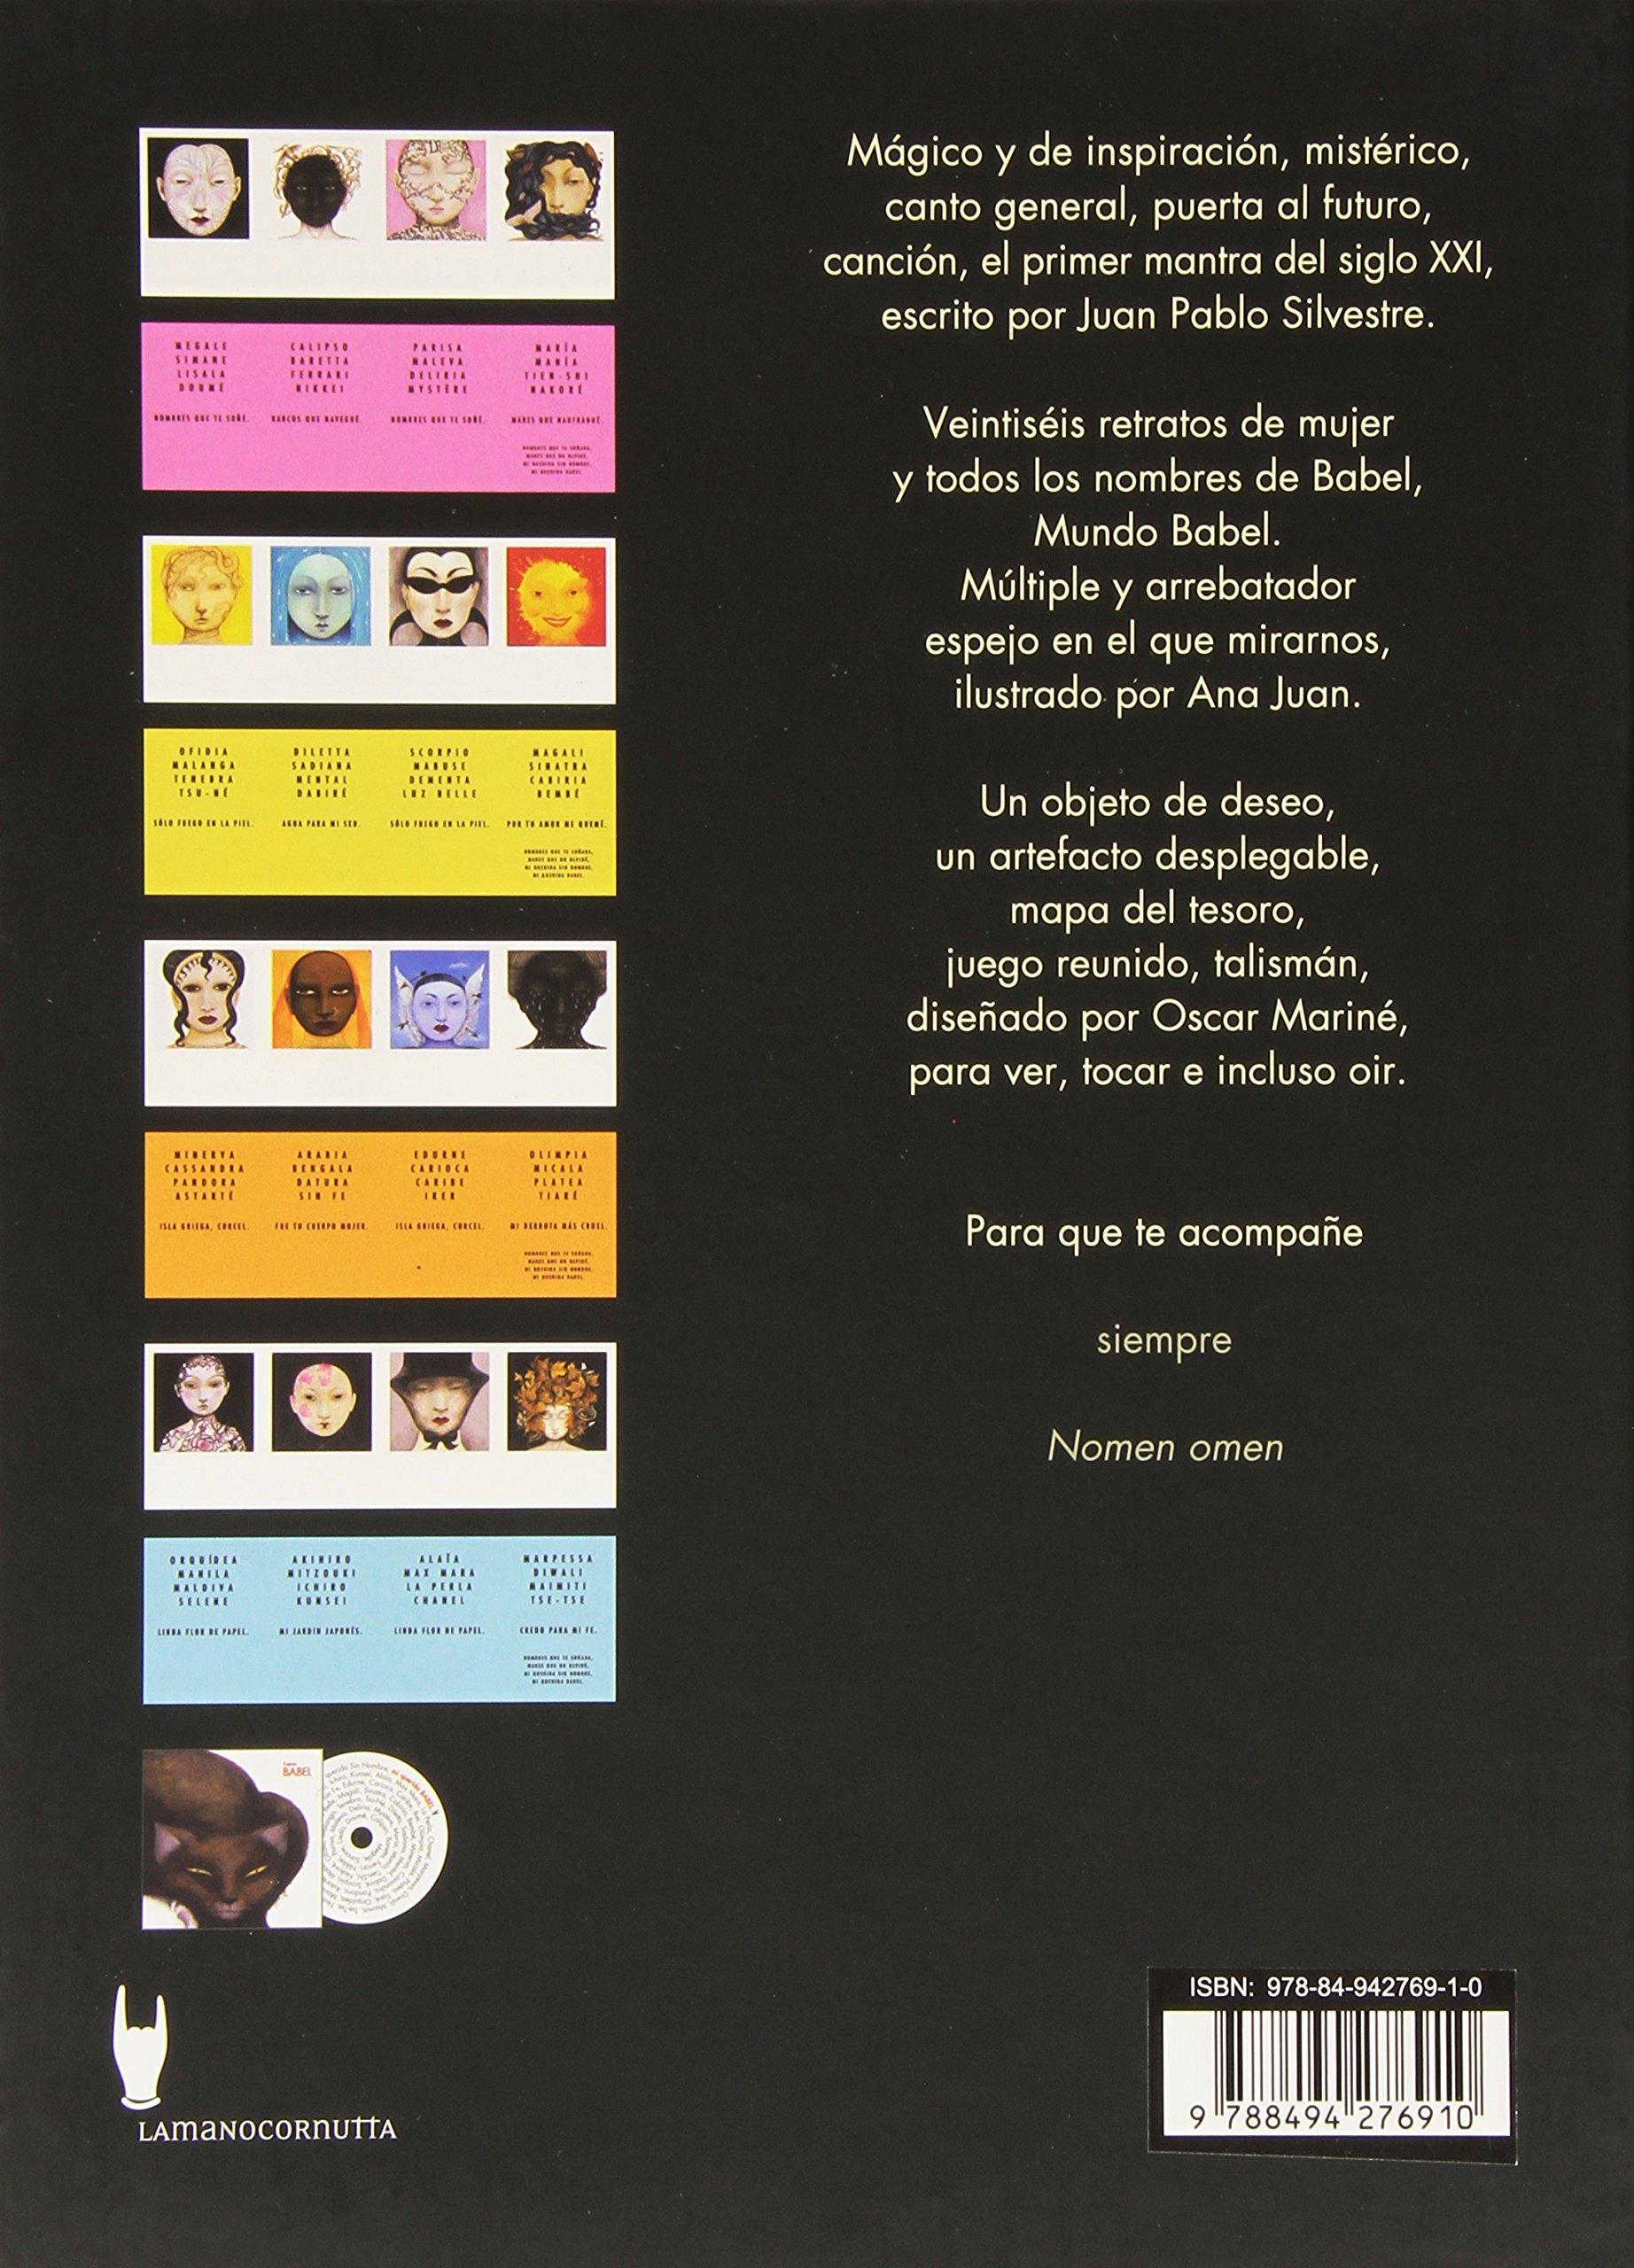 Mi querida Babel: Primer mantra del siglo XXI: Amazon.es: Juan Pablo Silvestre, Ana Juan: Libros